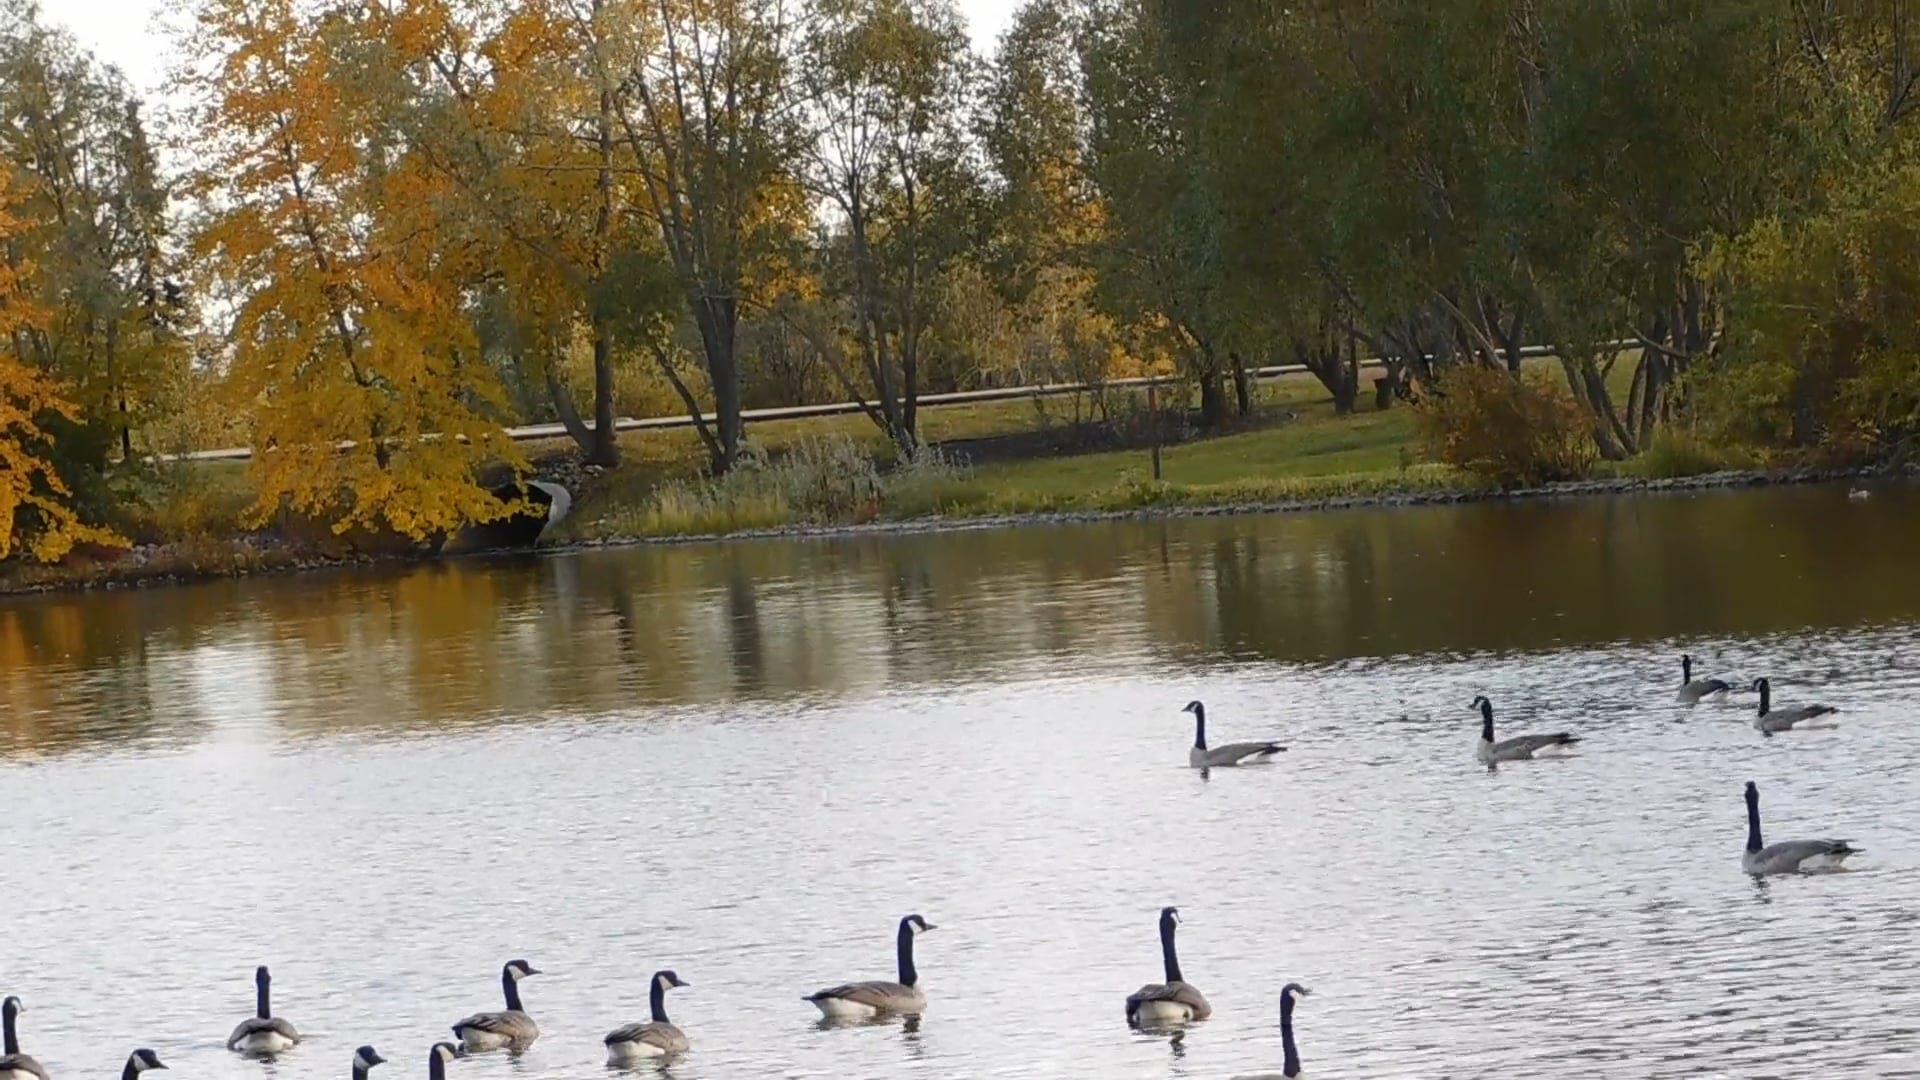 Birds In Flight-And Ducks On Water